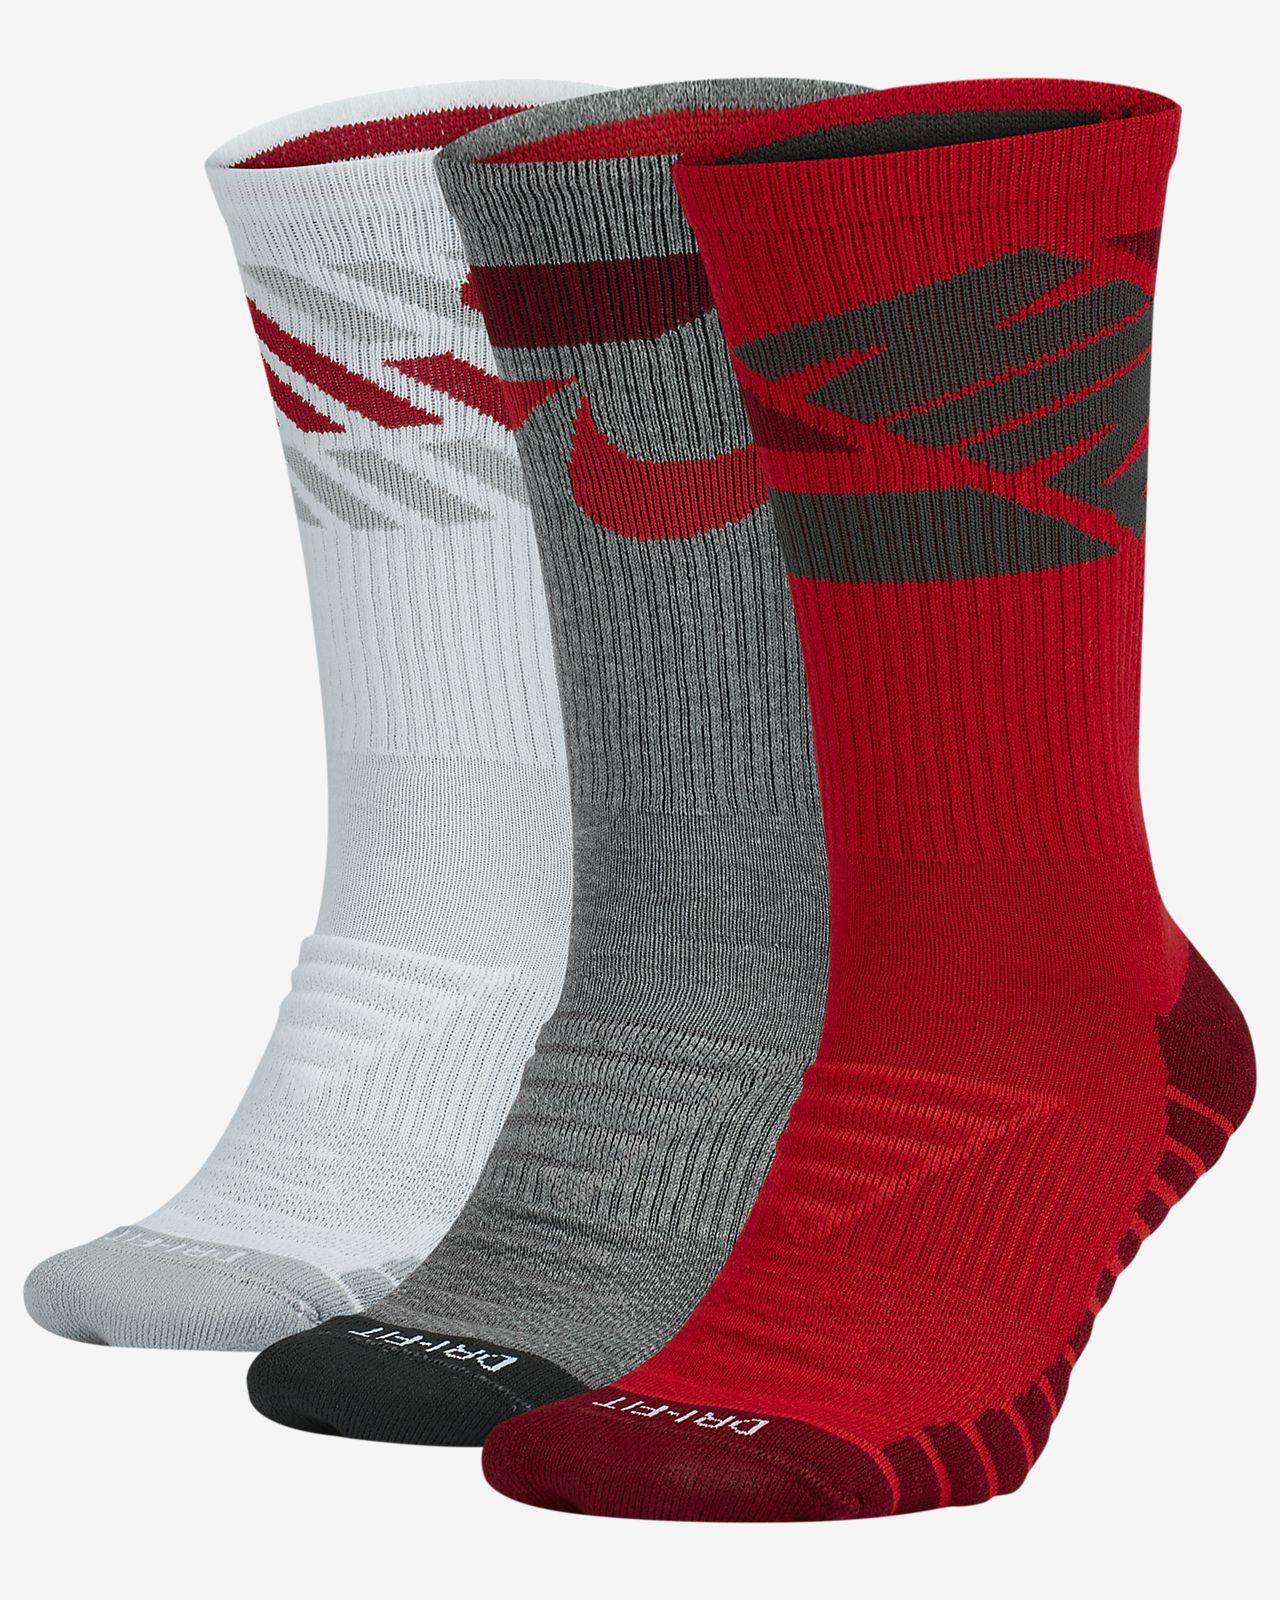 Nike Dry Crew Socks (3 Pair)